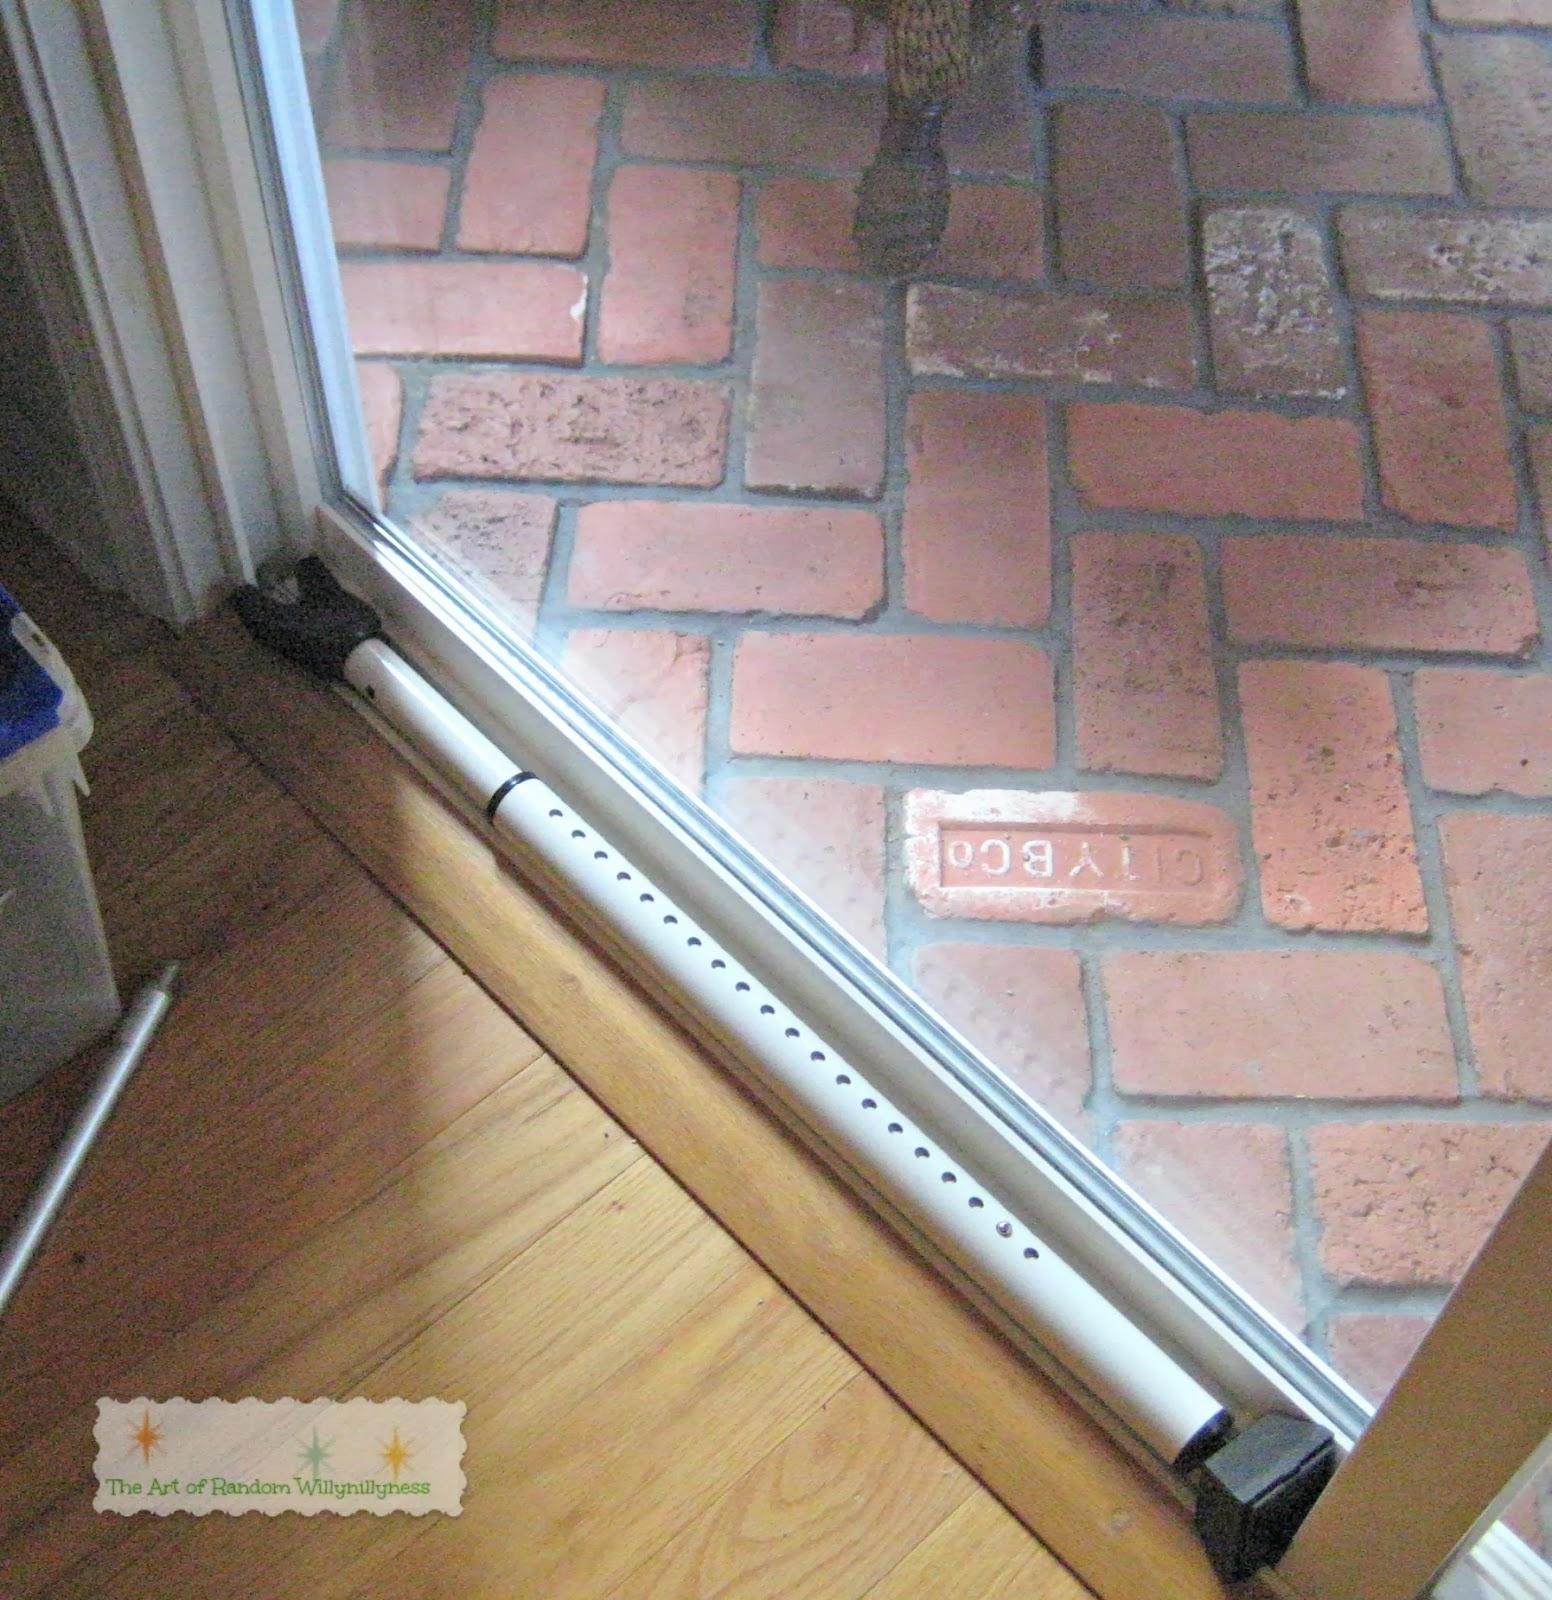 Security Bar Lock For Sliding Glass Doorssliding door security bar